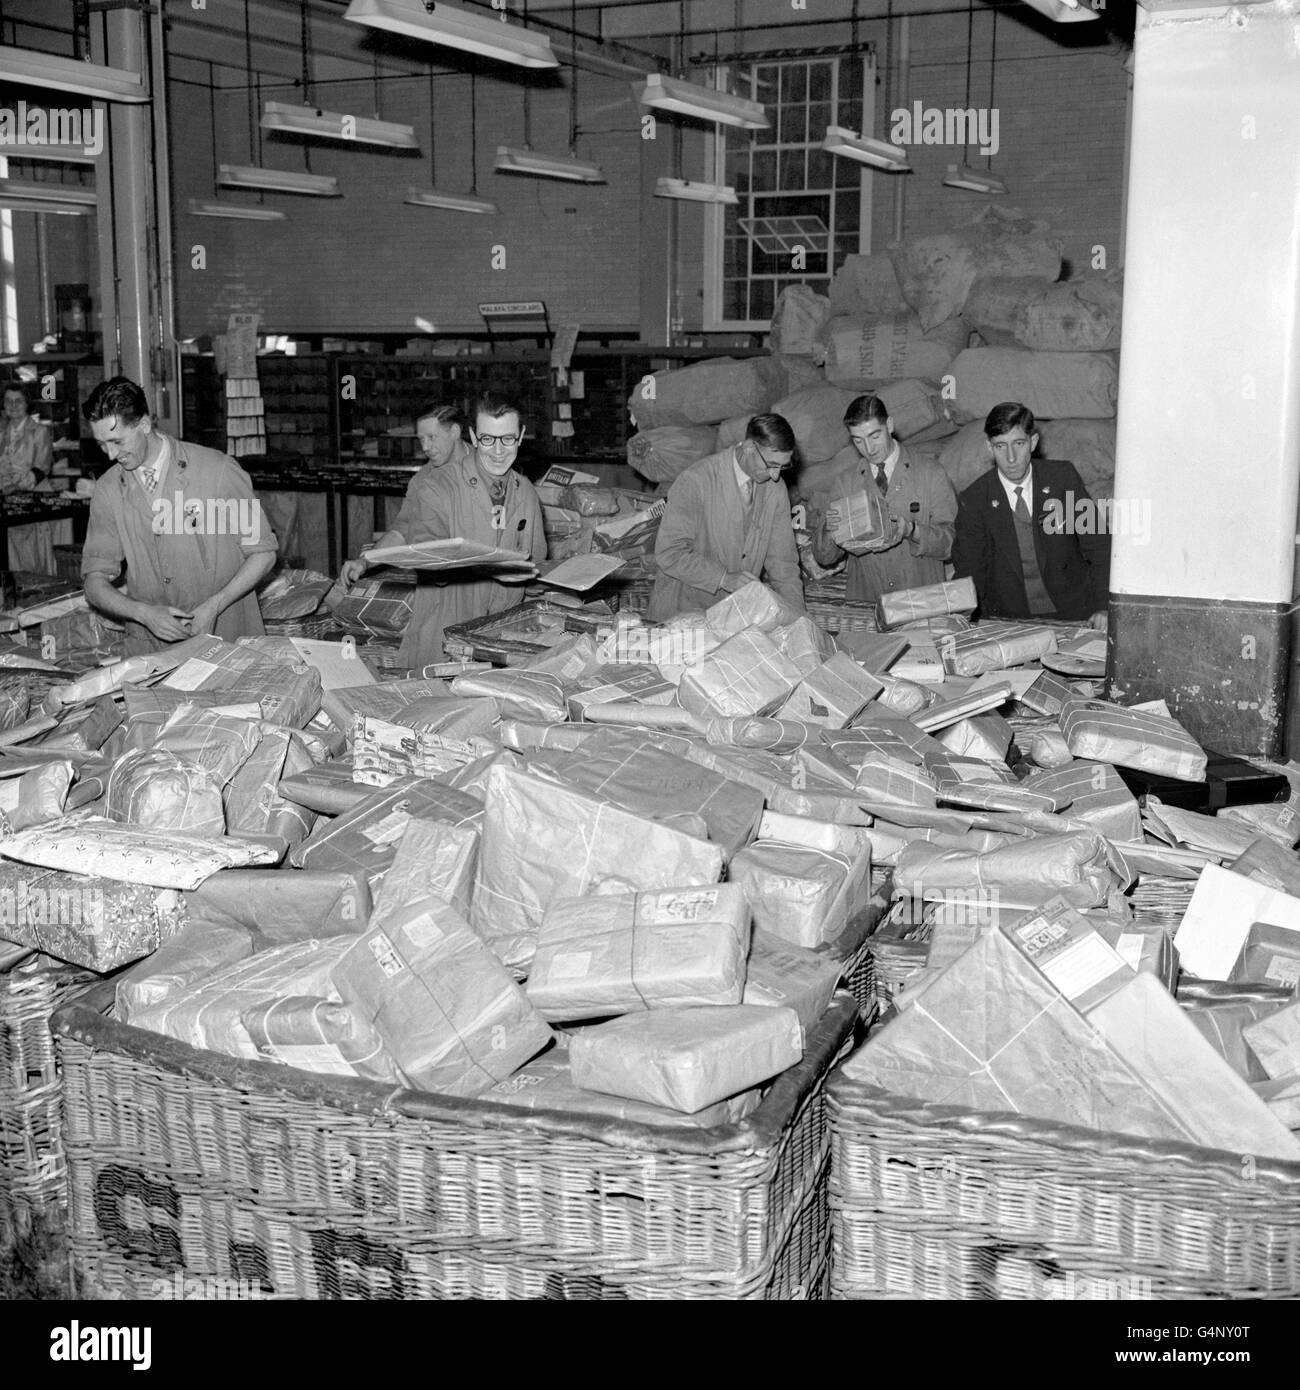 British Postal Service - Mail Sorting - London - Stock Image